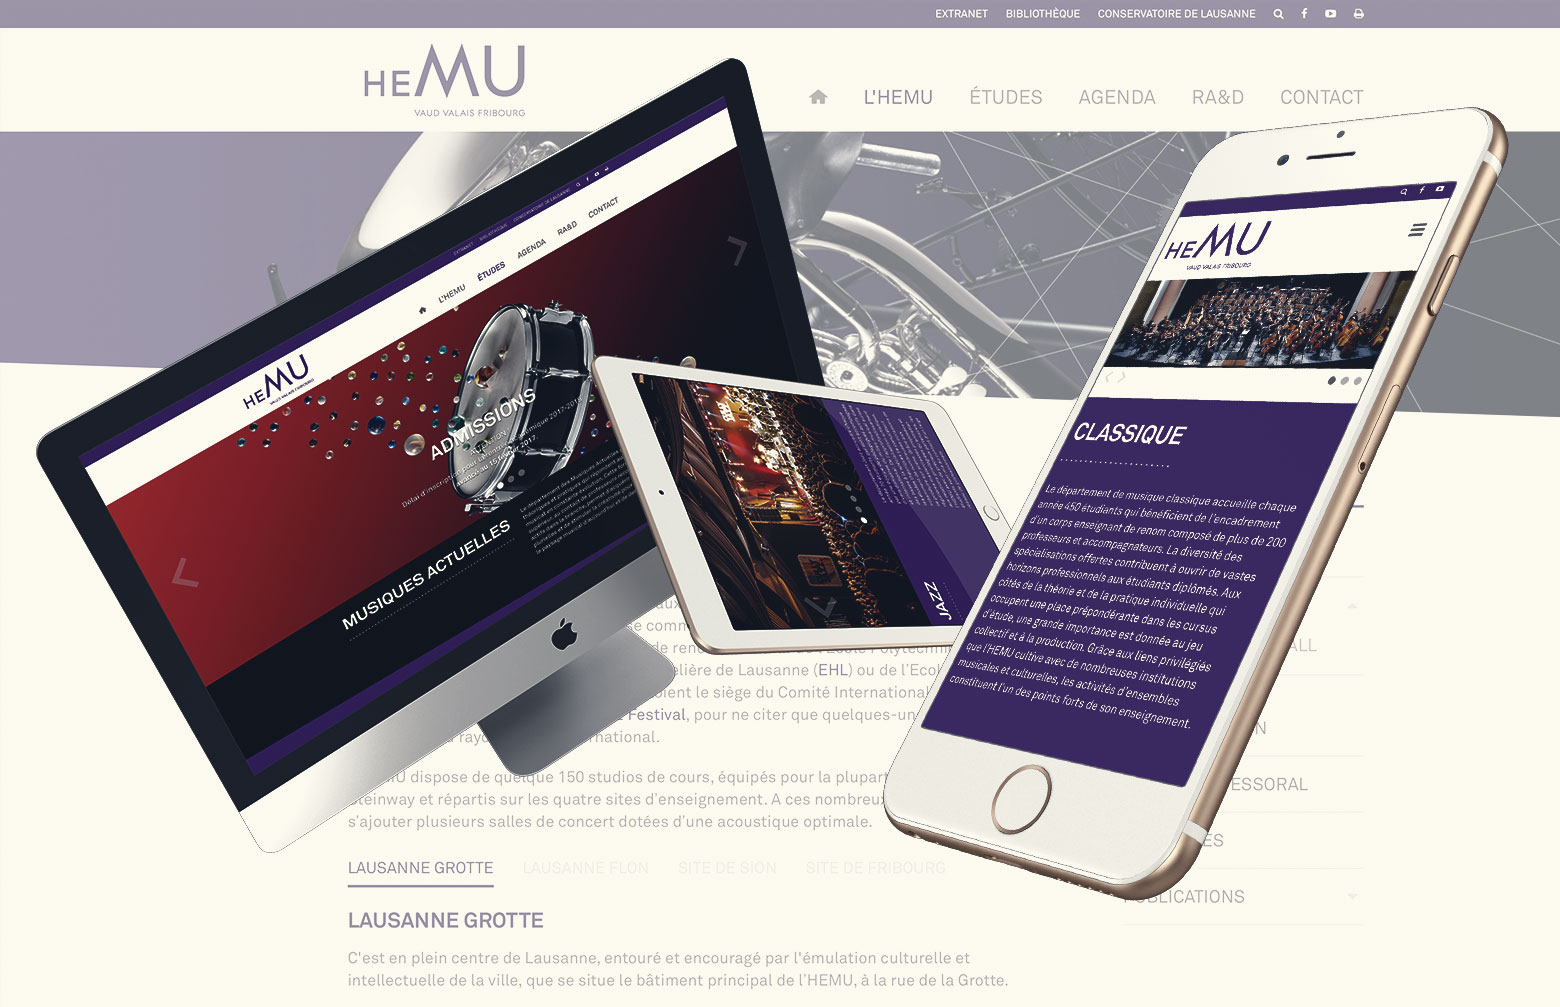 HEMU WNG agence digitale